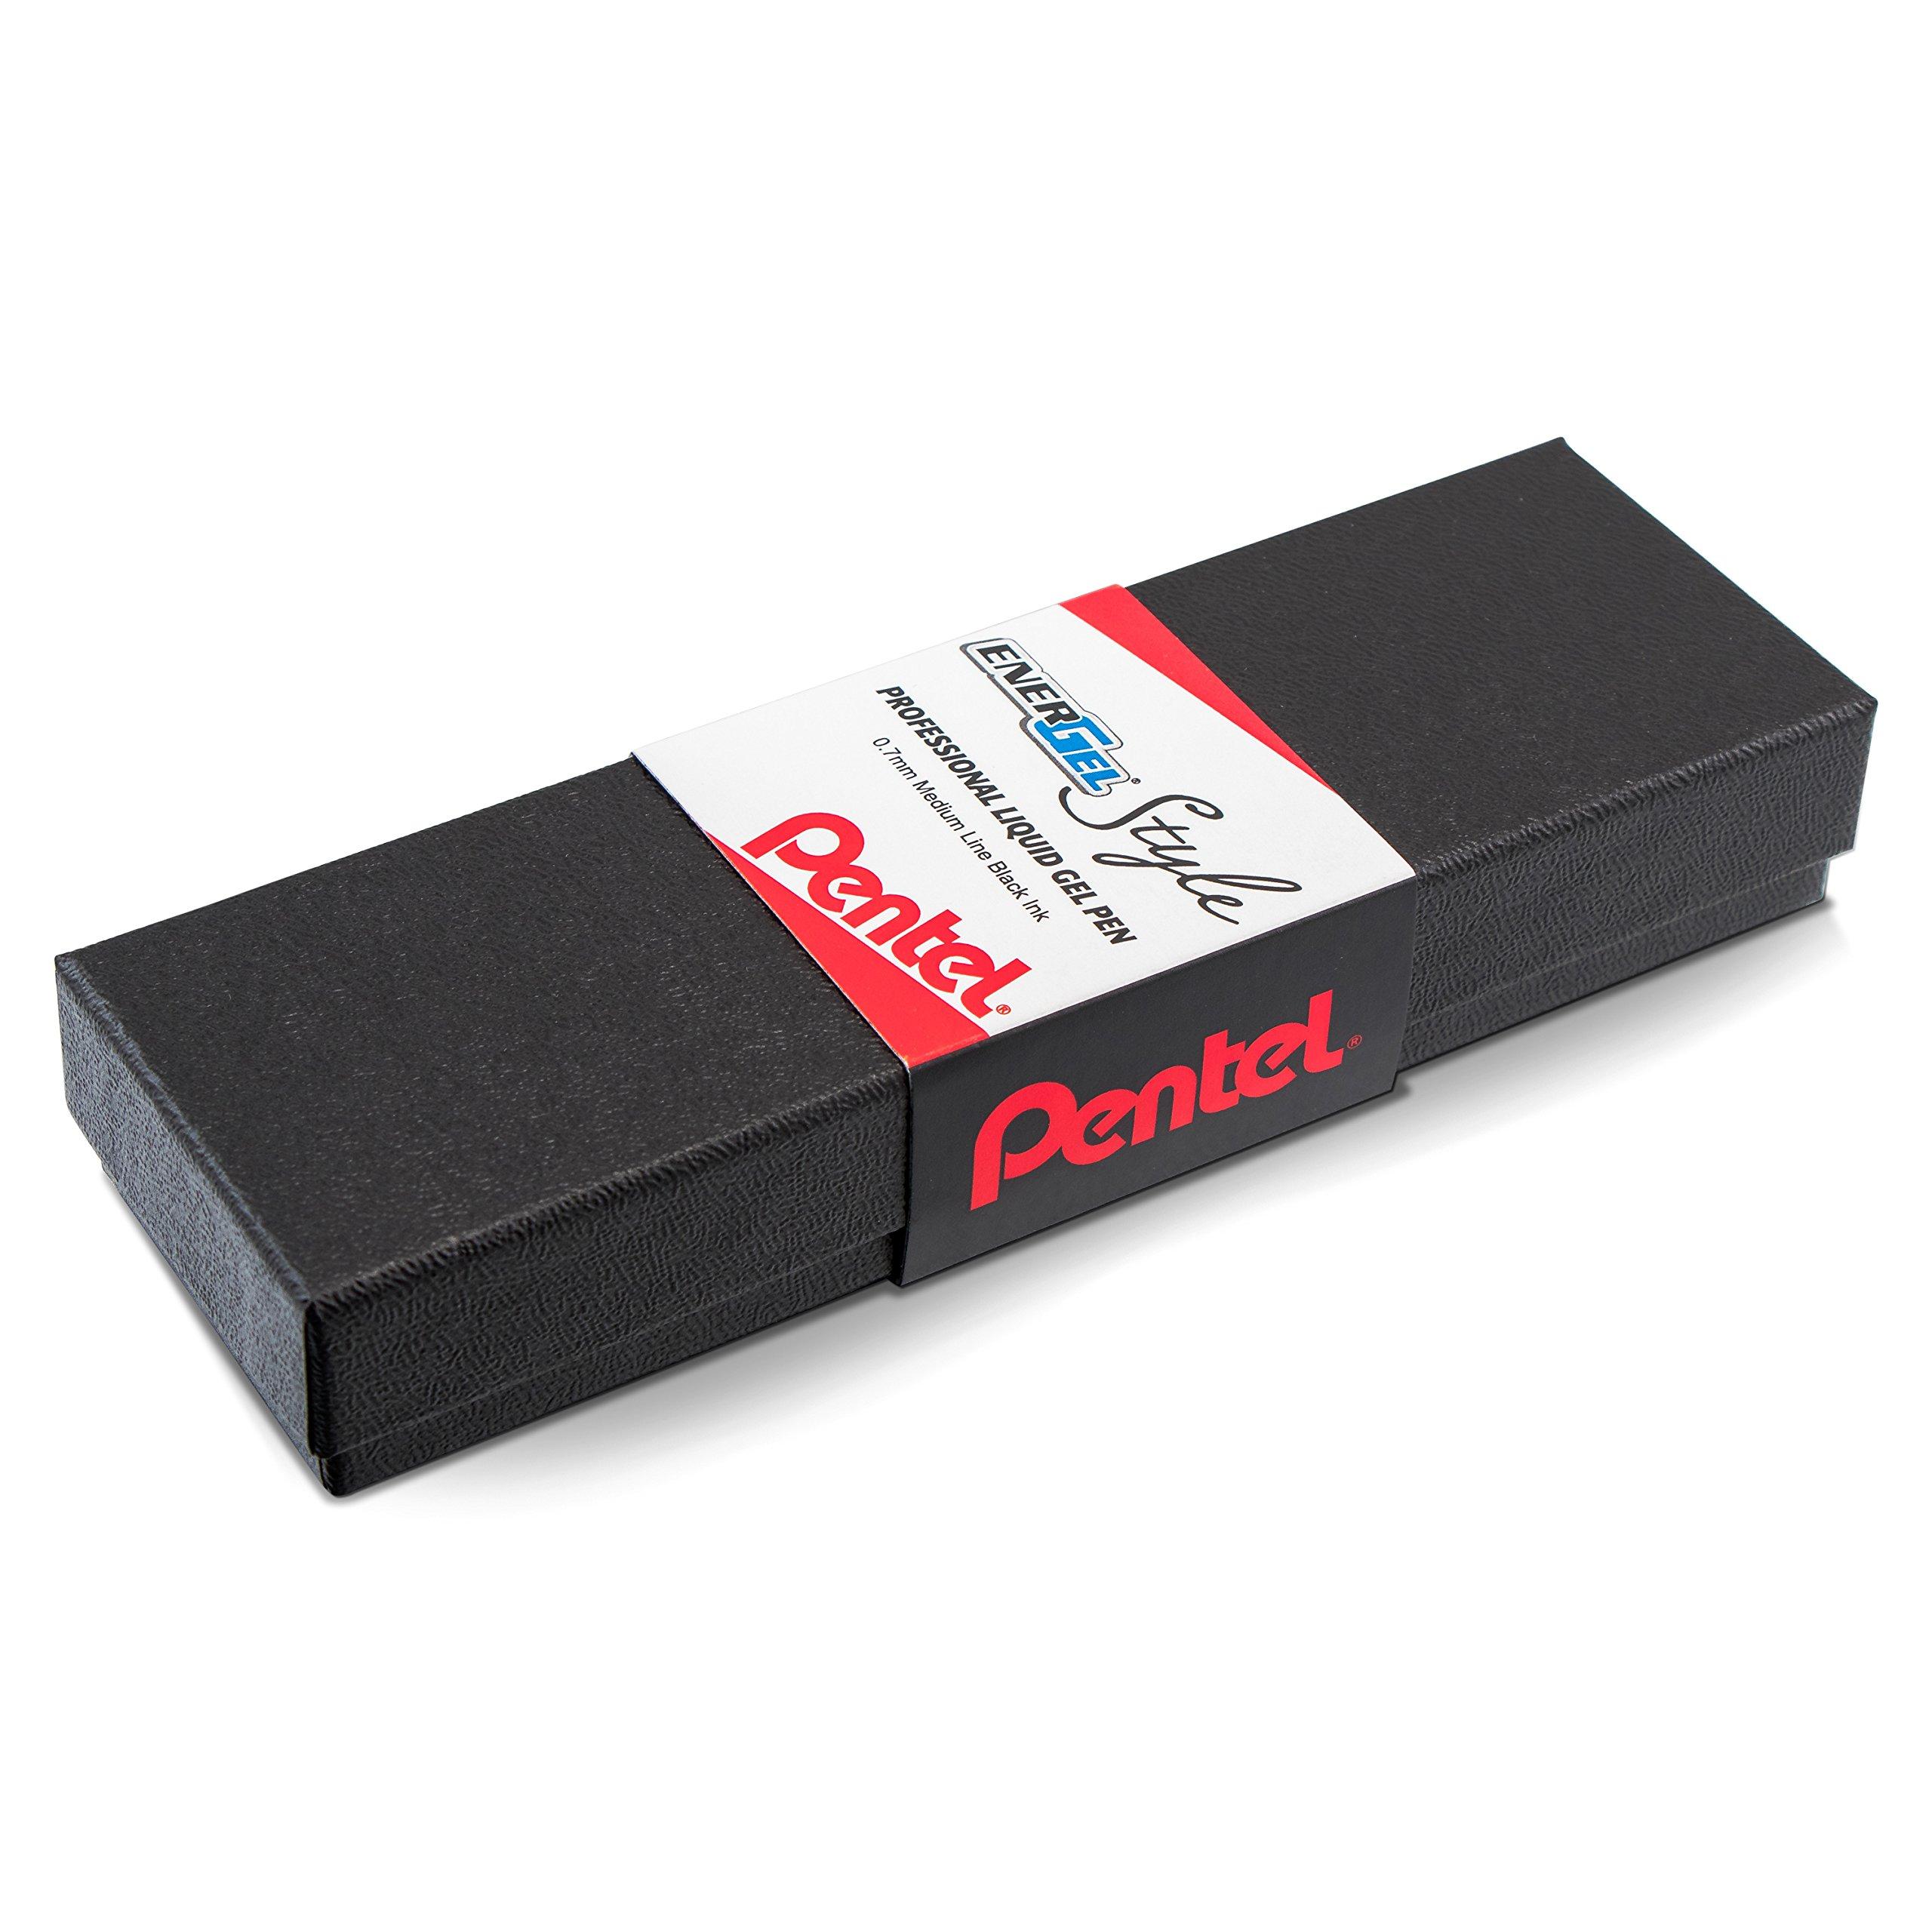 Pentel EnerGel Style Gel Pen, (0.7mm) Medium Line,Teal Blue Barrel - BL2007SABX by Pentel (Image #6)